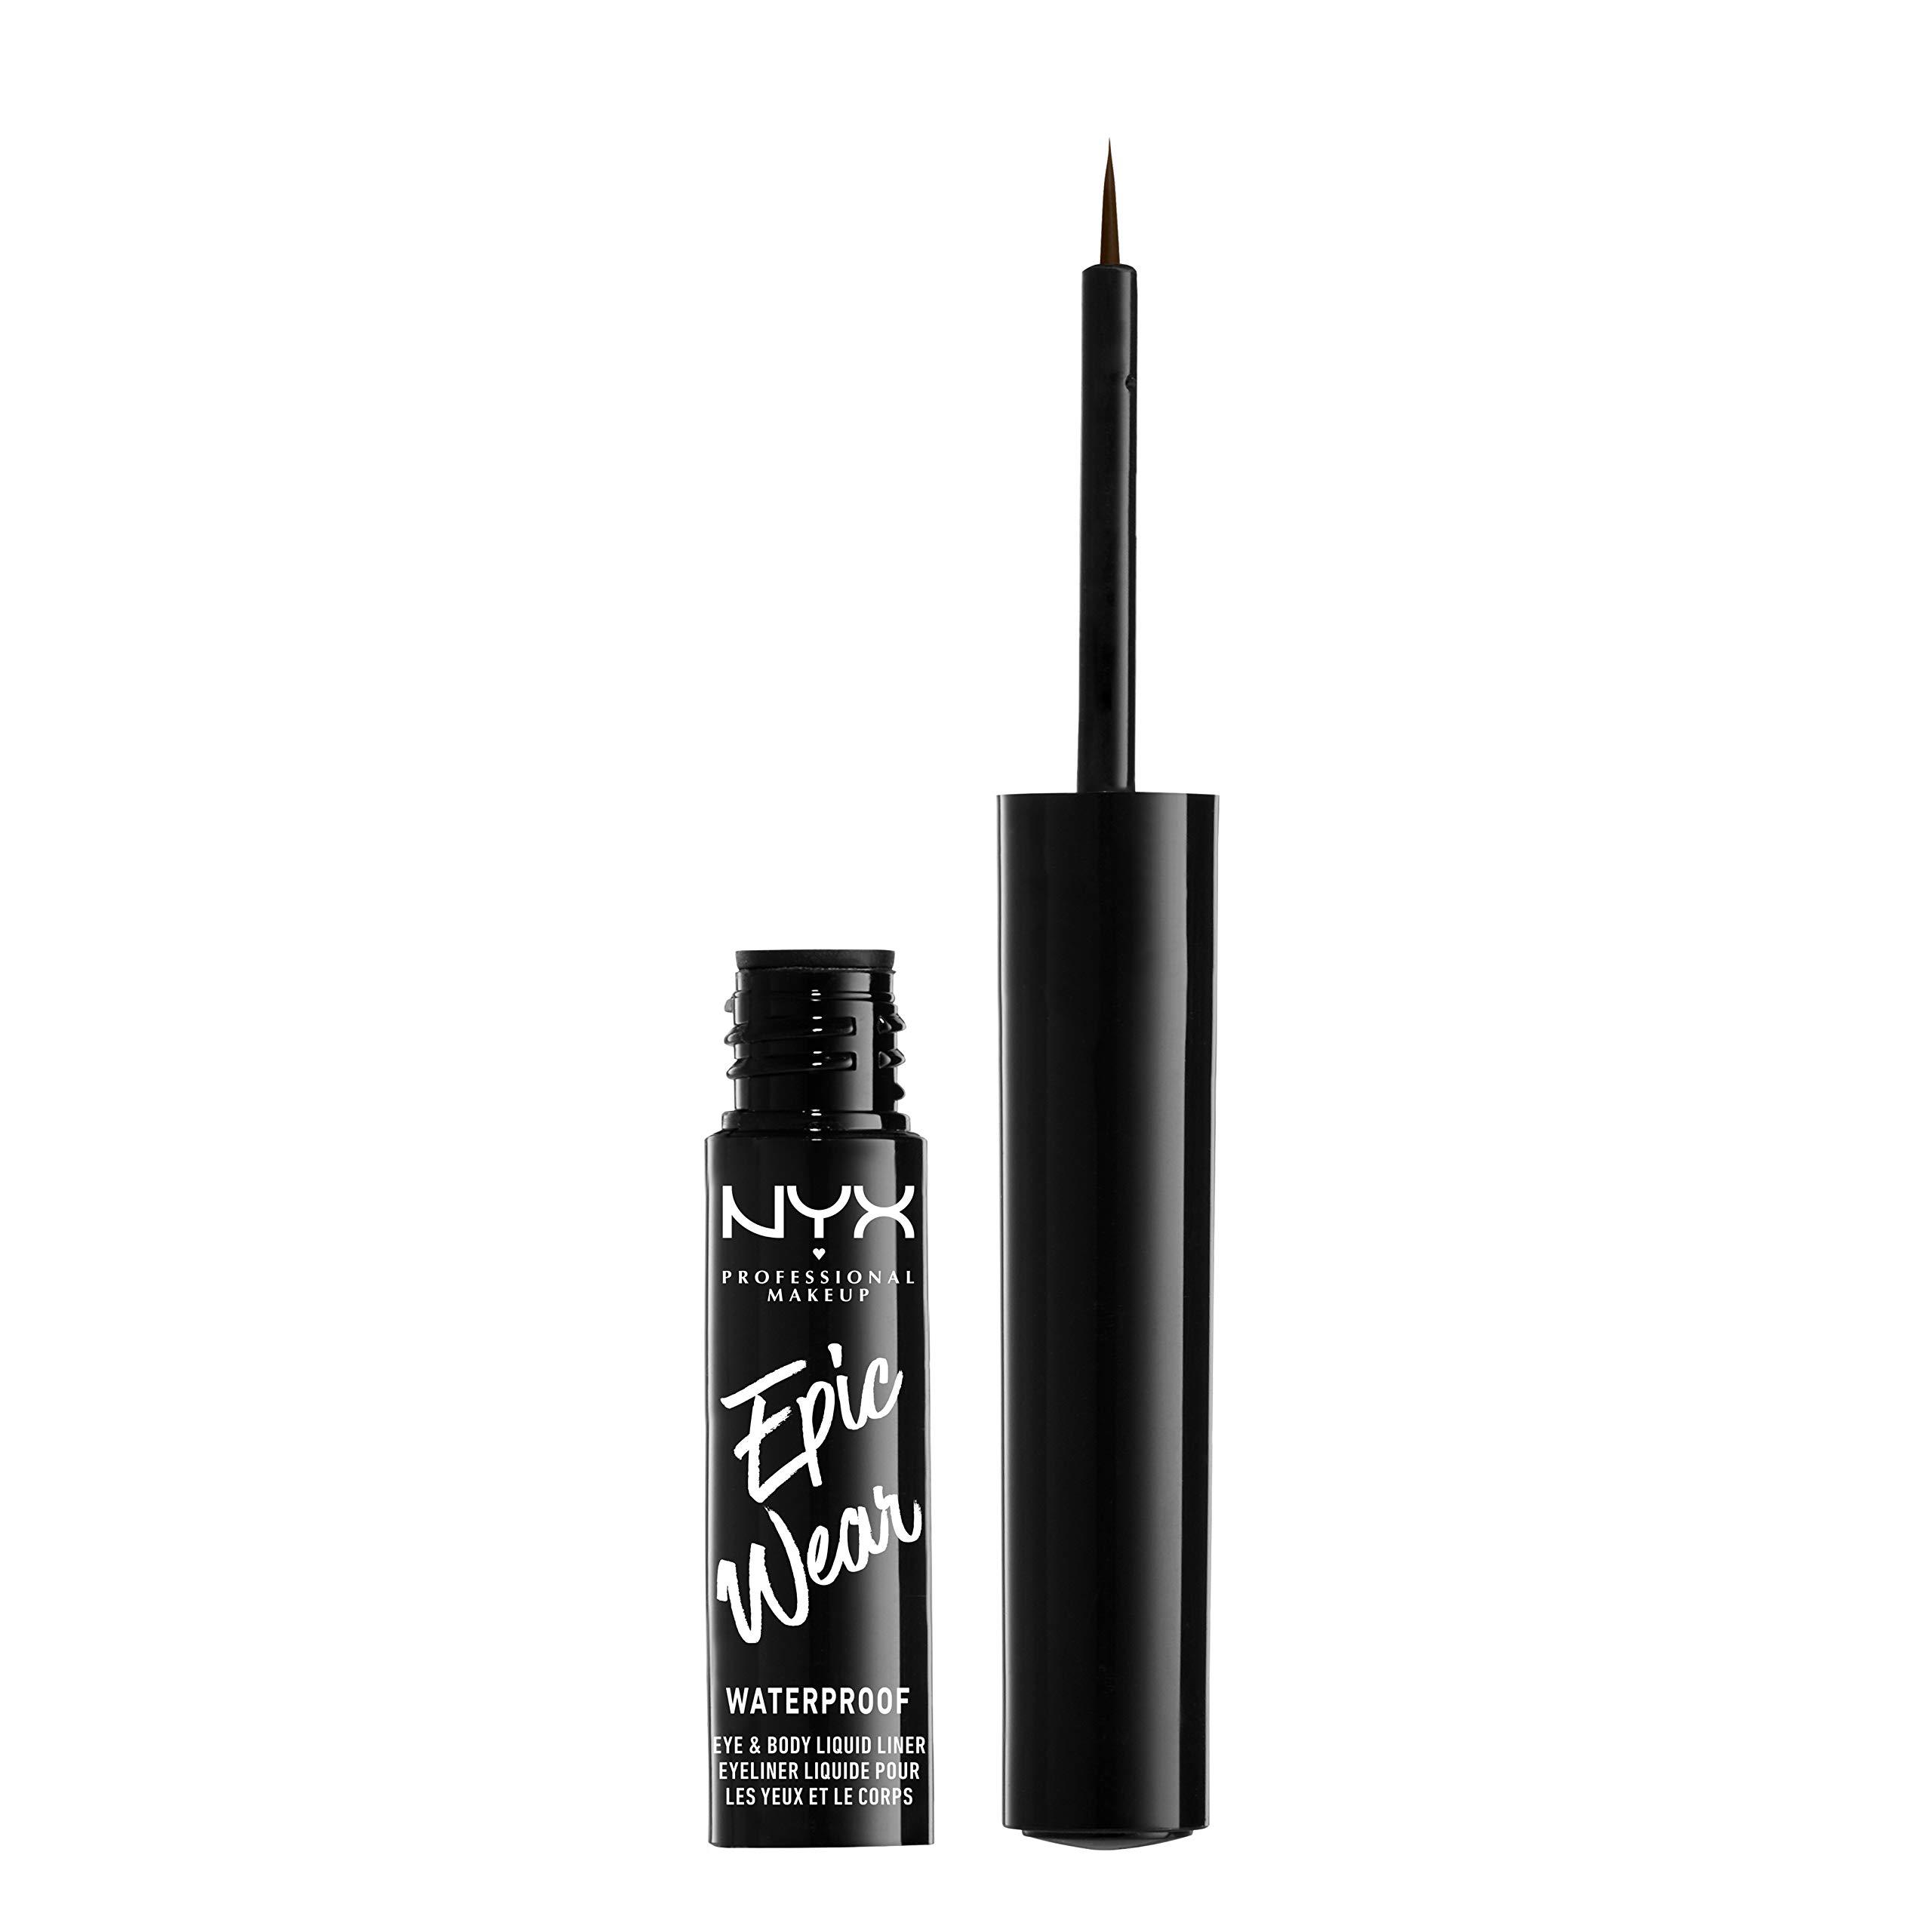 NNYX PROFESSIONAL MAKEUP Epic Wear Liquid Liner, Brown